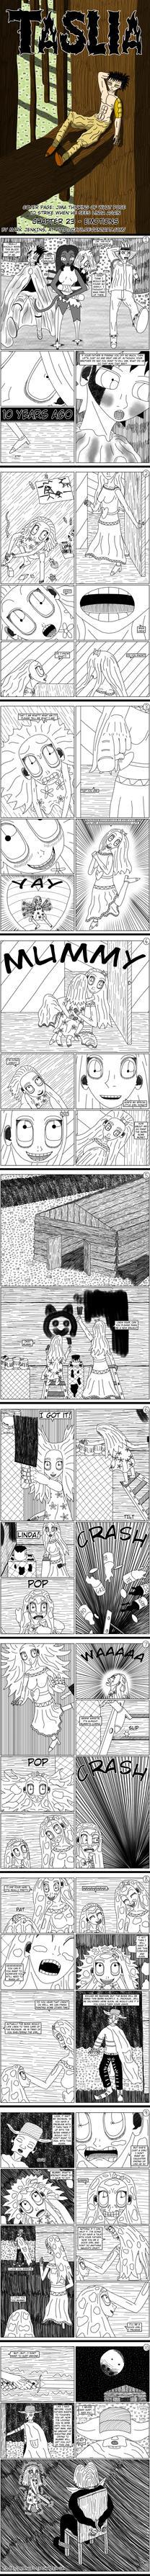 Taslia comic - Chapter 23, by ZXY8 by zxy8